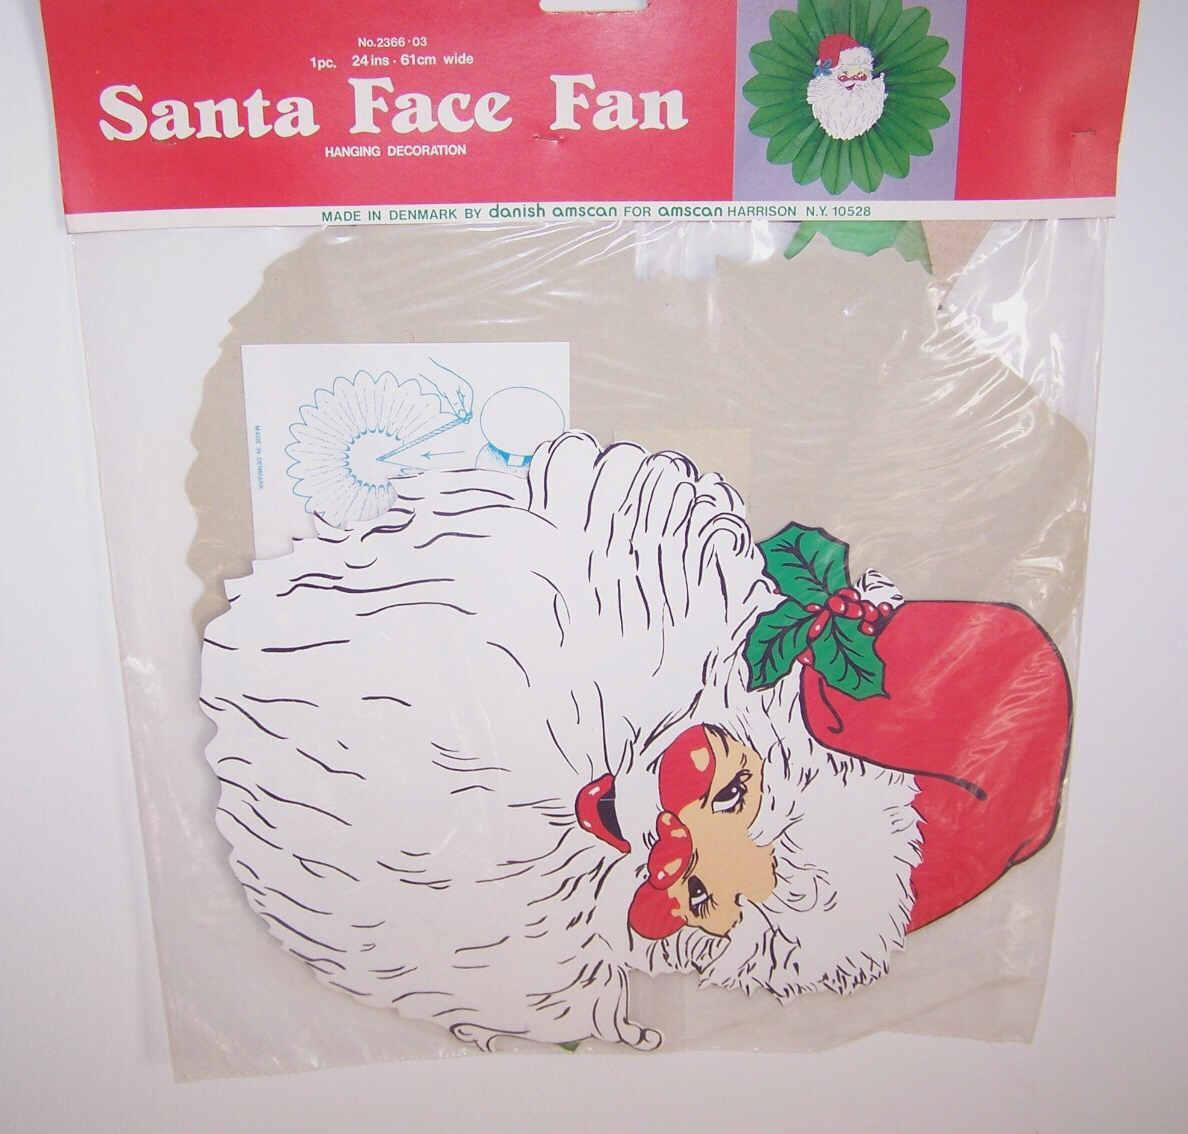 C.1981 Santa Face Honeycomb Fan By Danish Amscan - Mint in Package!